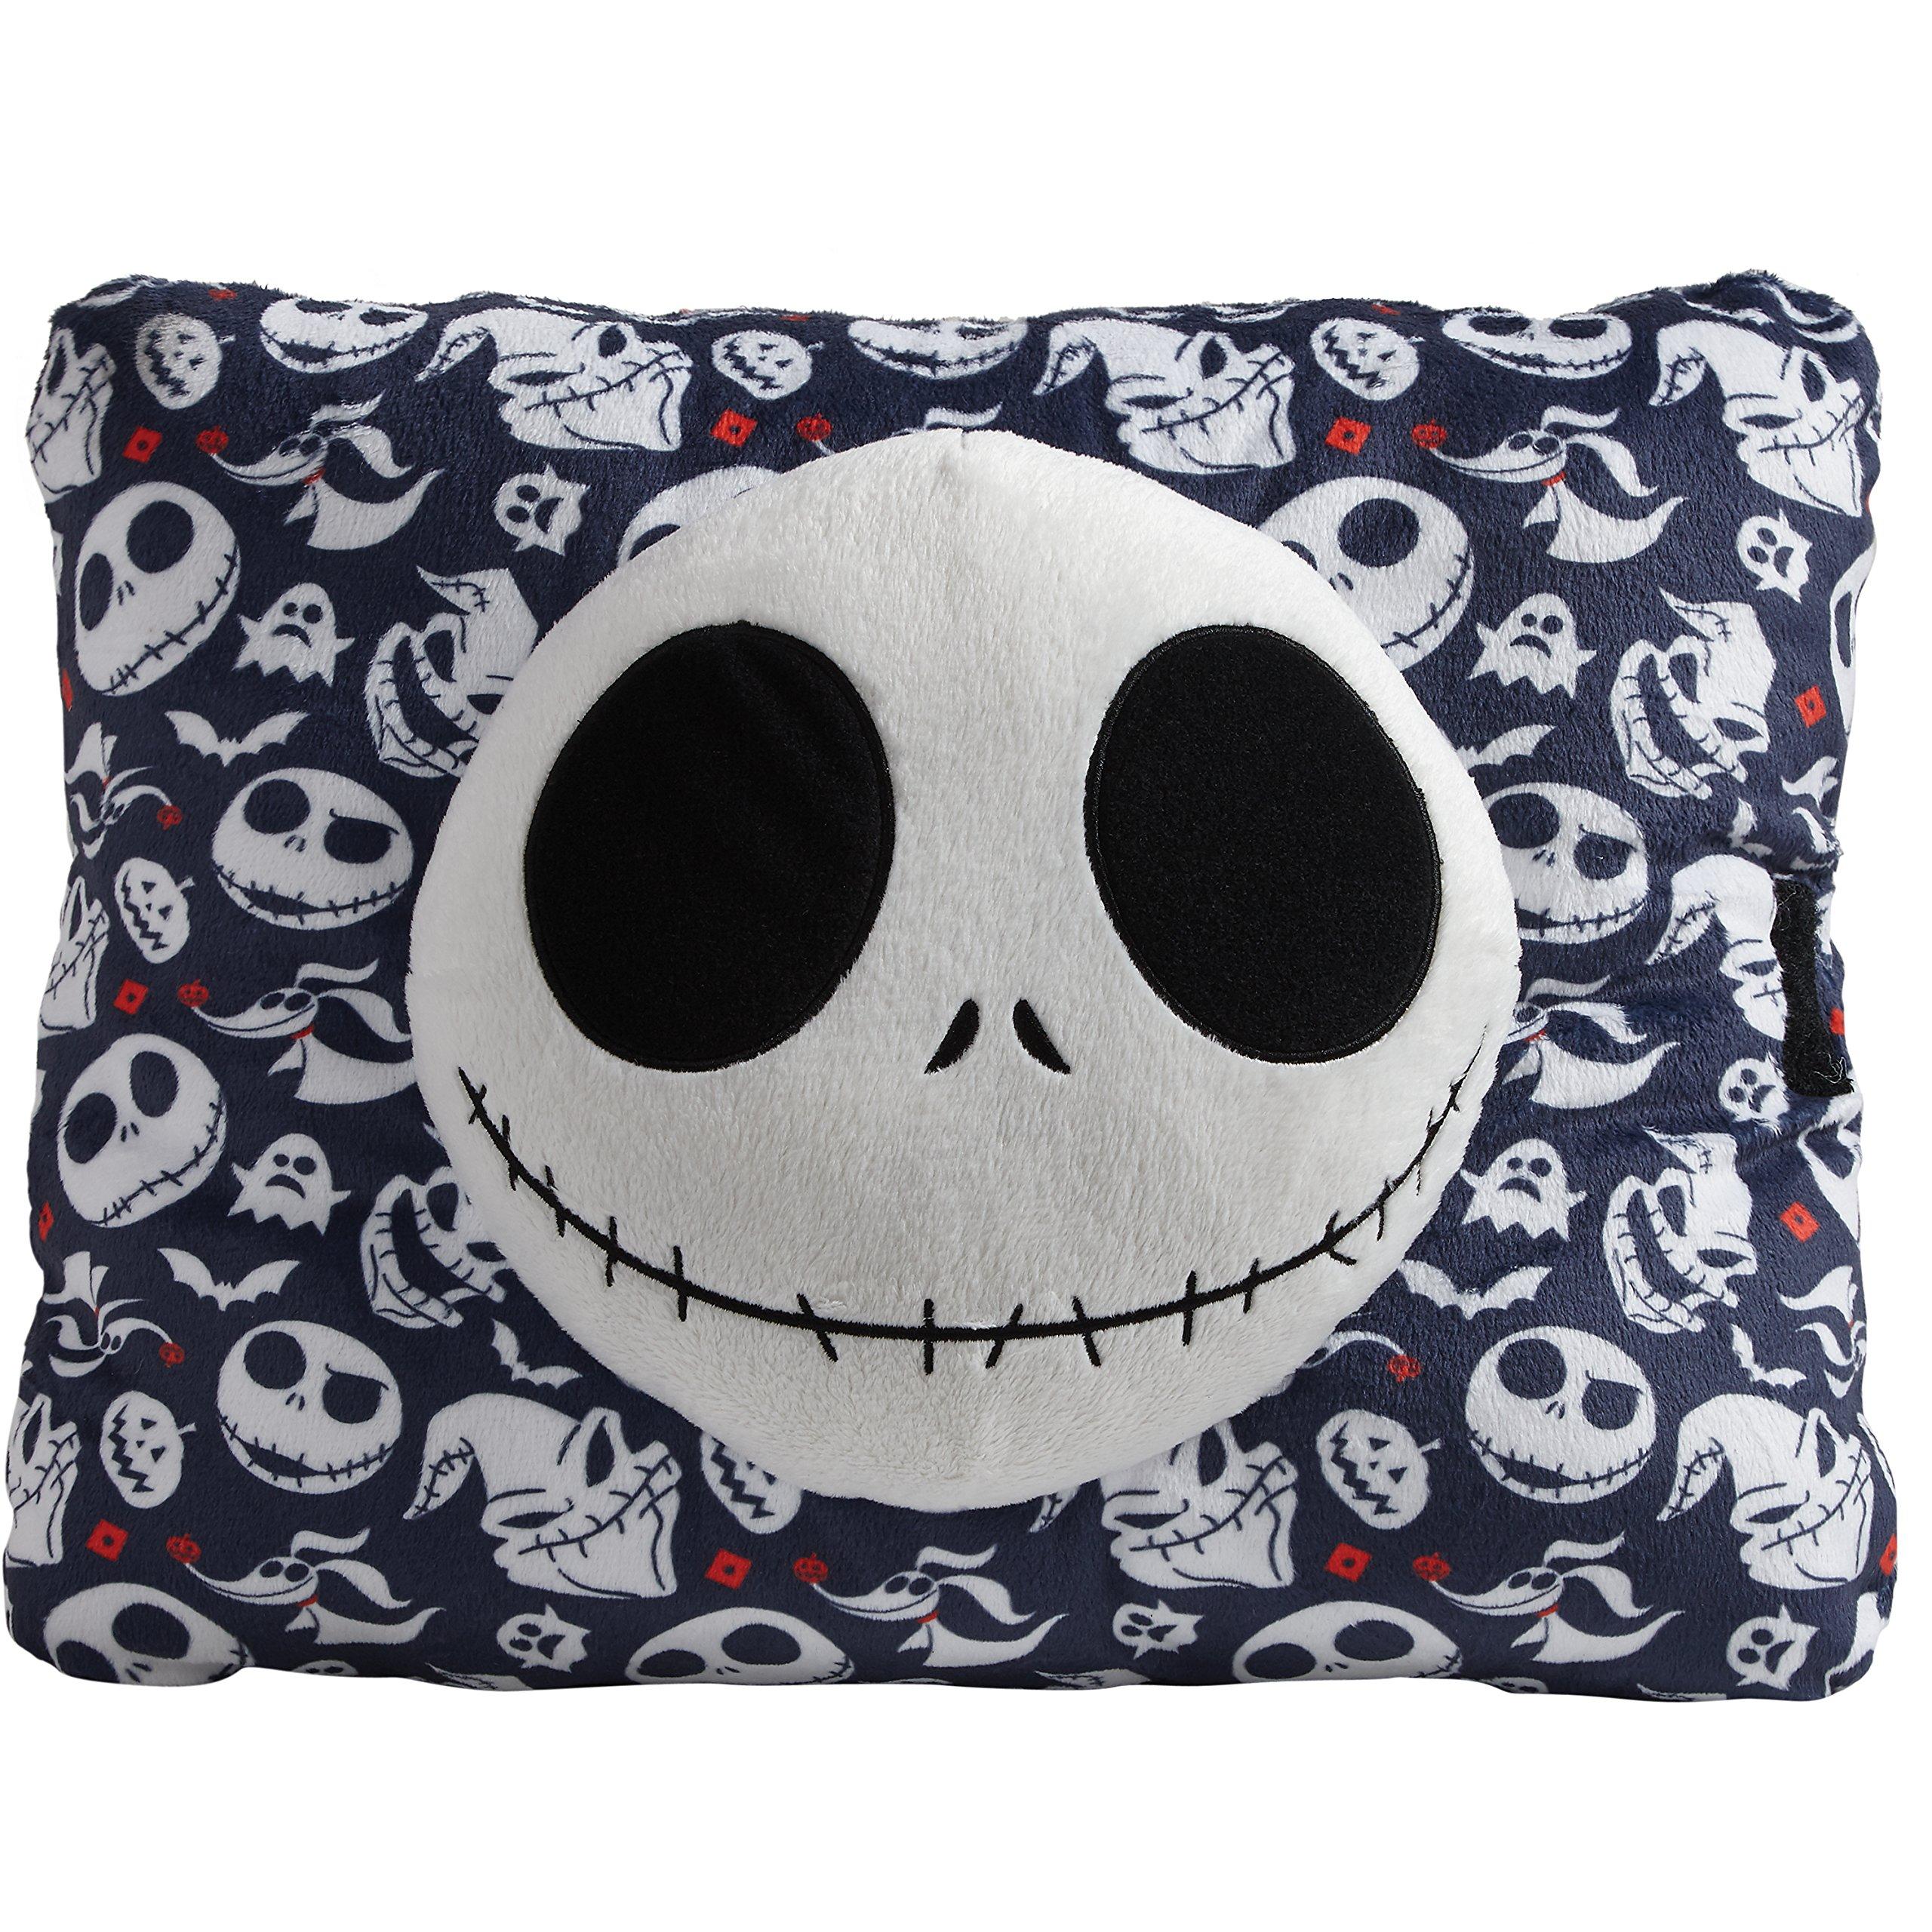 Pillow Pets Expressions, Disney Nightmare Before Christmas Jack Skellington Dark Blue 16'' Stuffed Animal Plush Toy